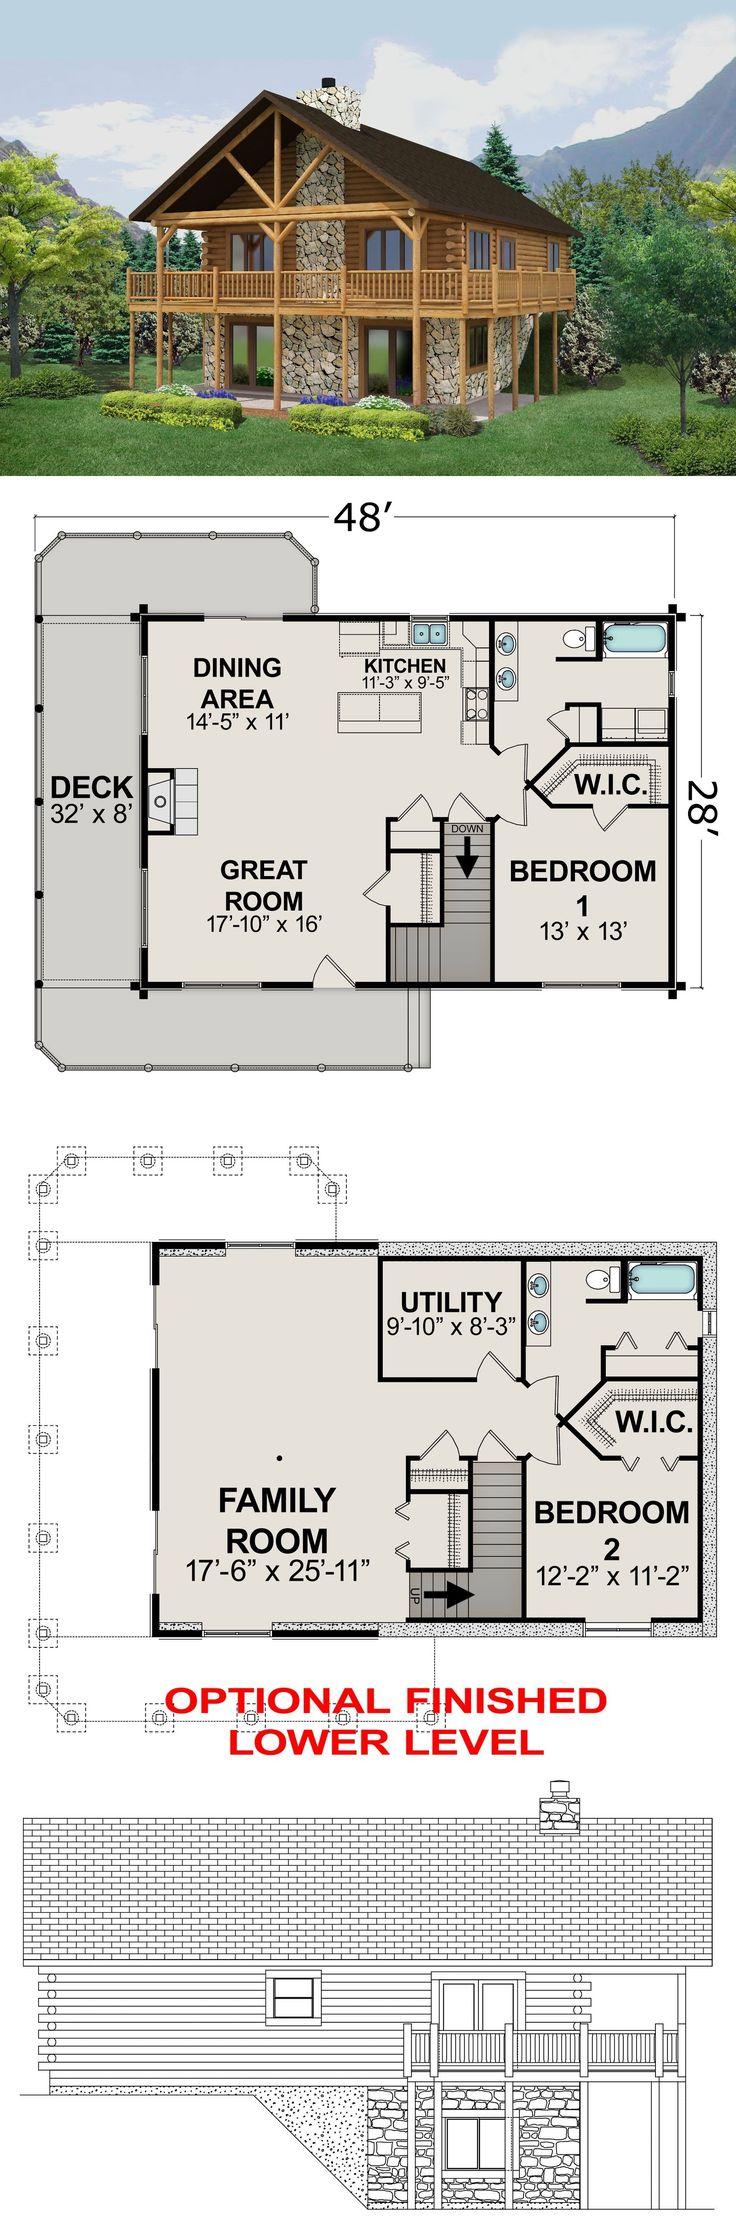 Good small house floor plans cottage amazing pictures grafikdede com - Building Plans And Blueprints 42130 Ranch Home Plan 1120 Sq Ft Usb Drive